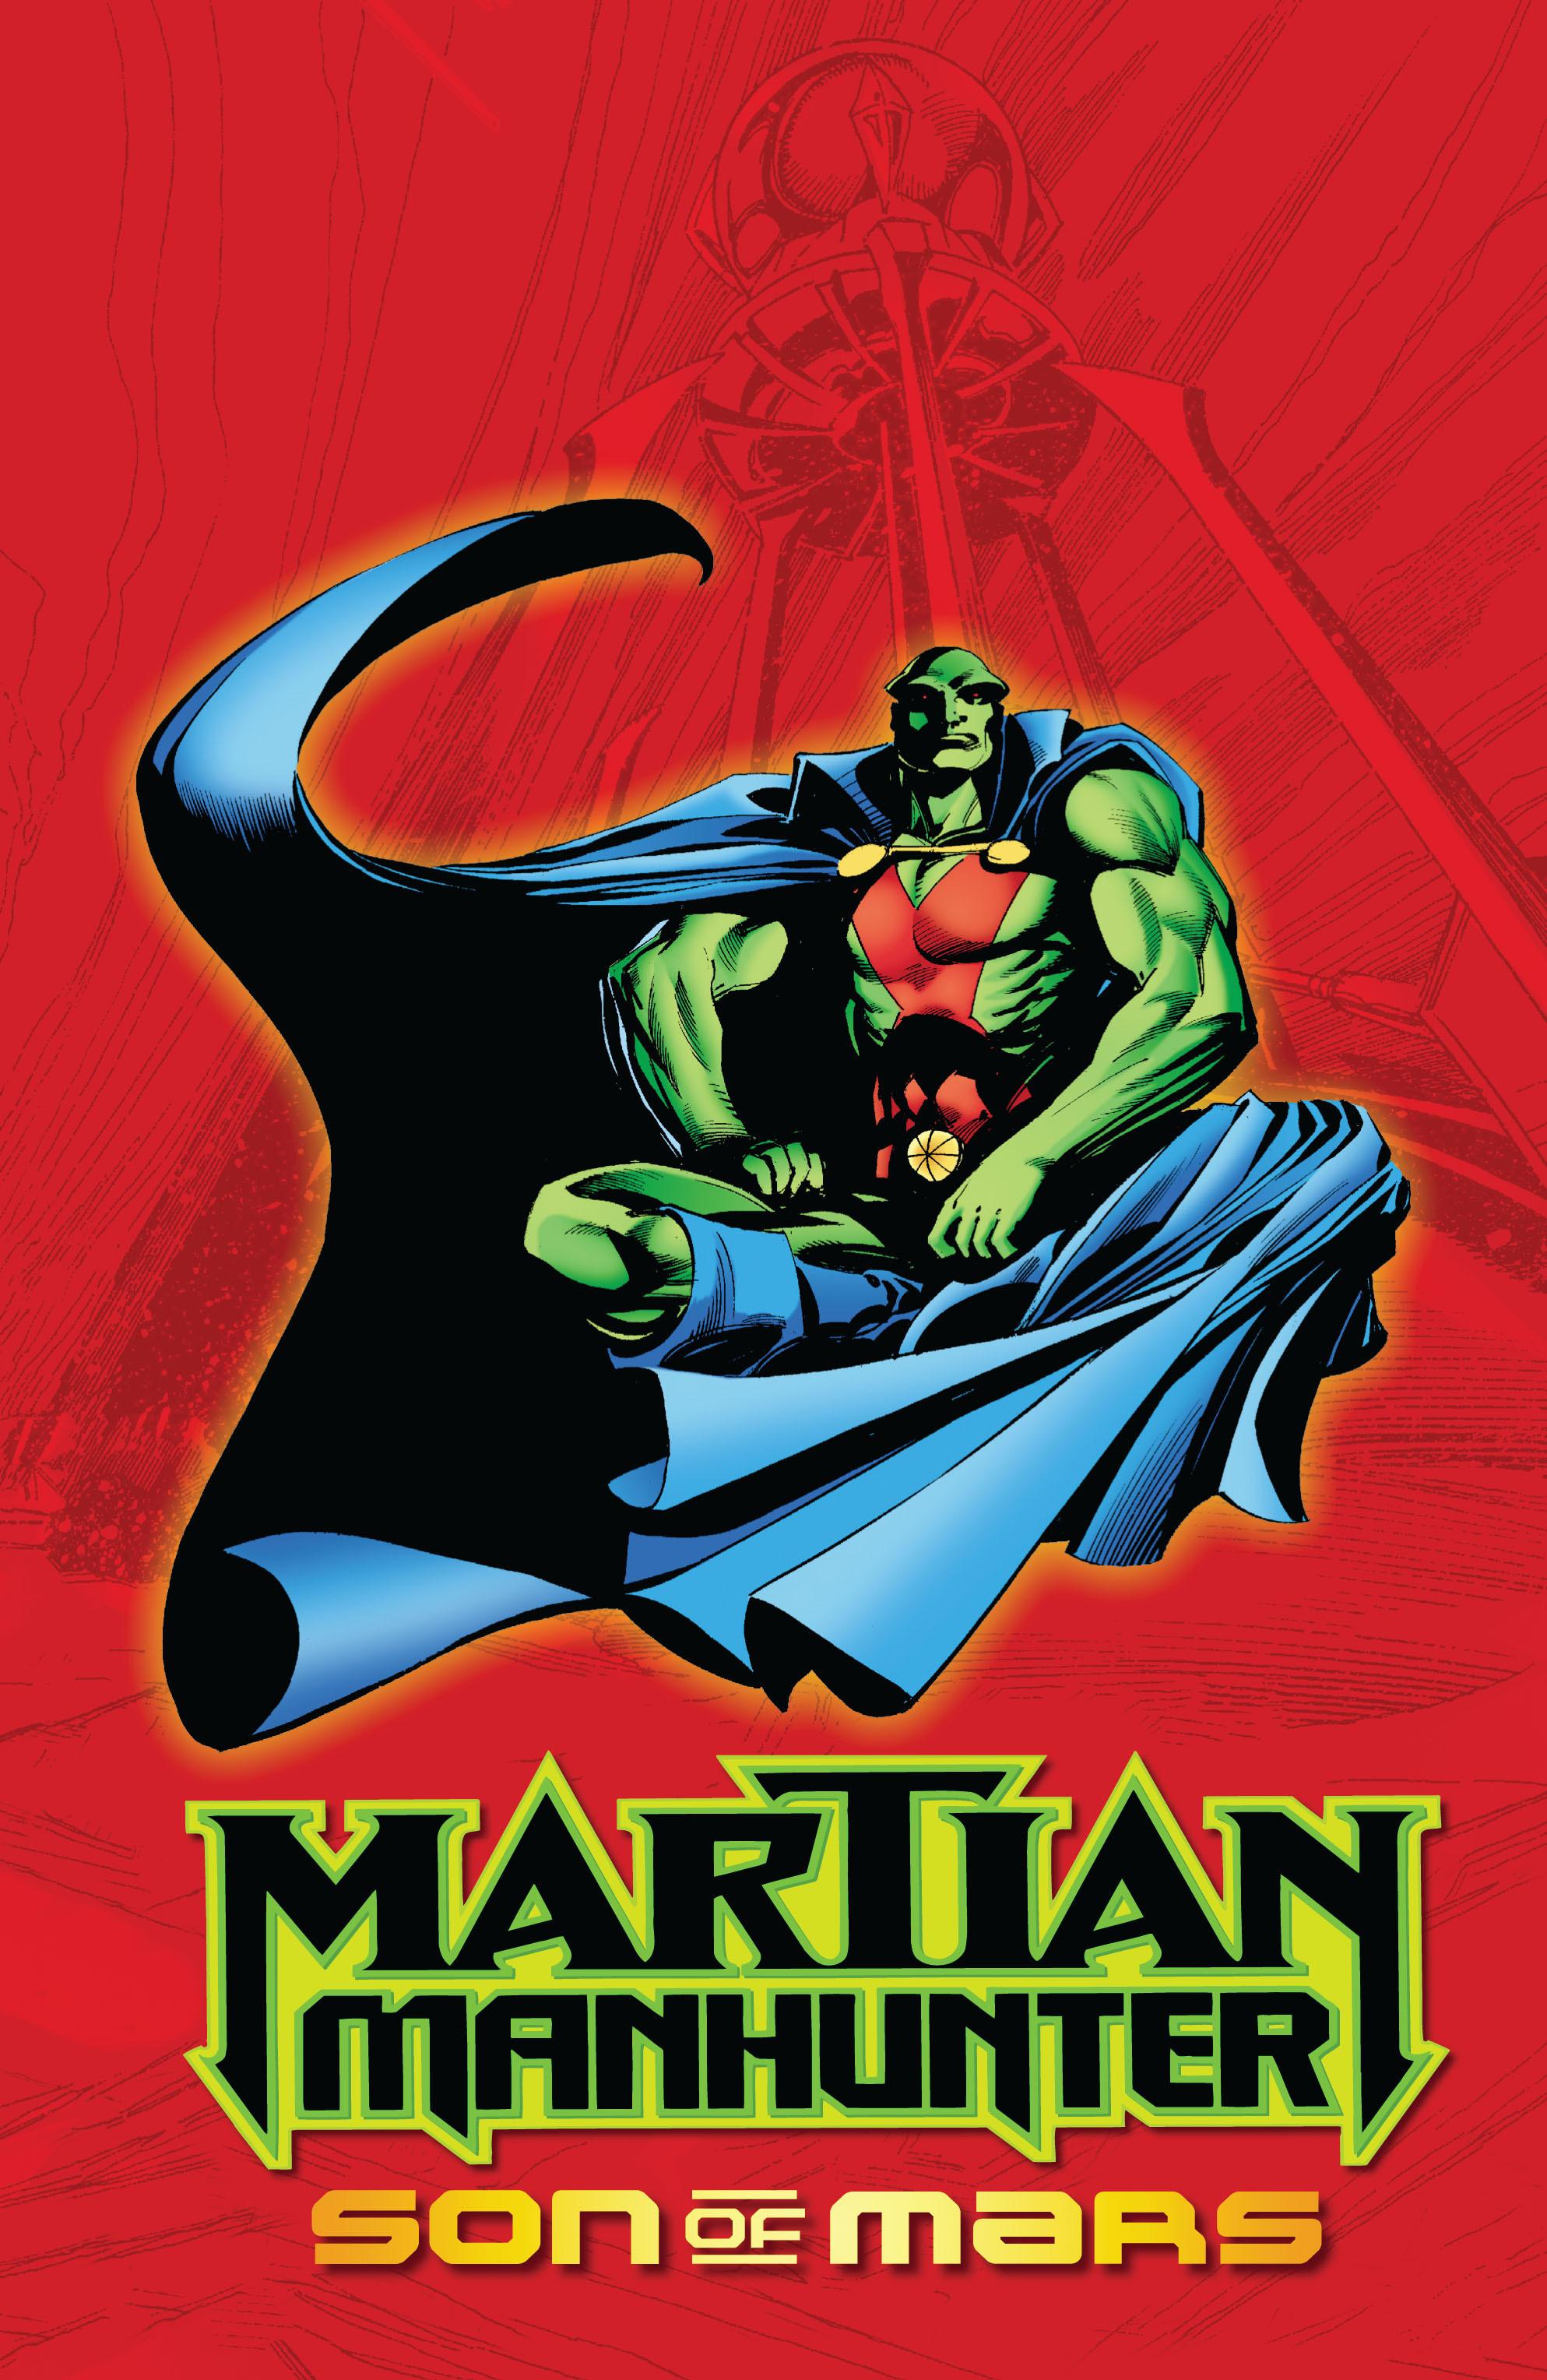 Read online Martian Manhunter: Son of Mars comic -  Issue # TPB - 3